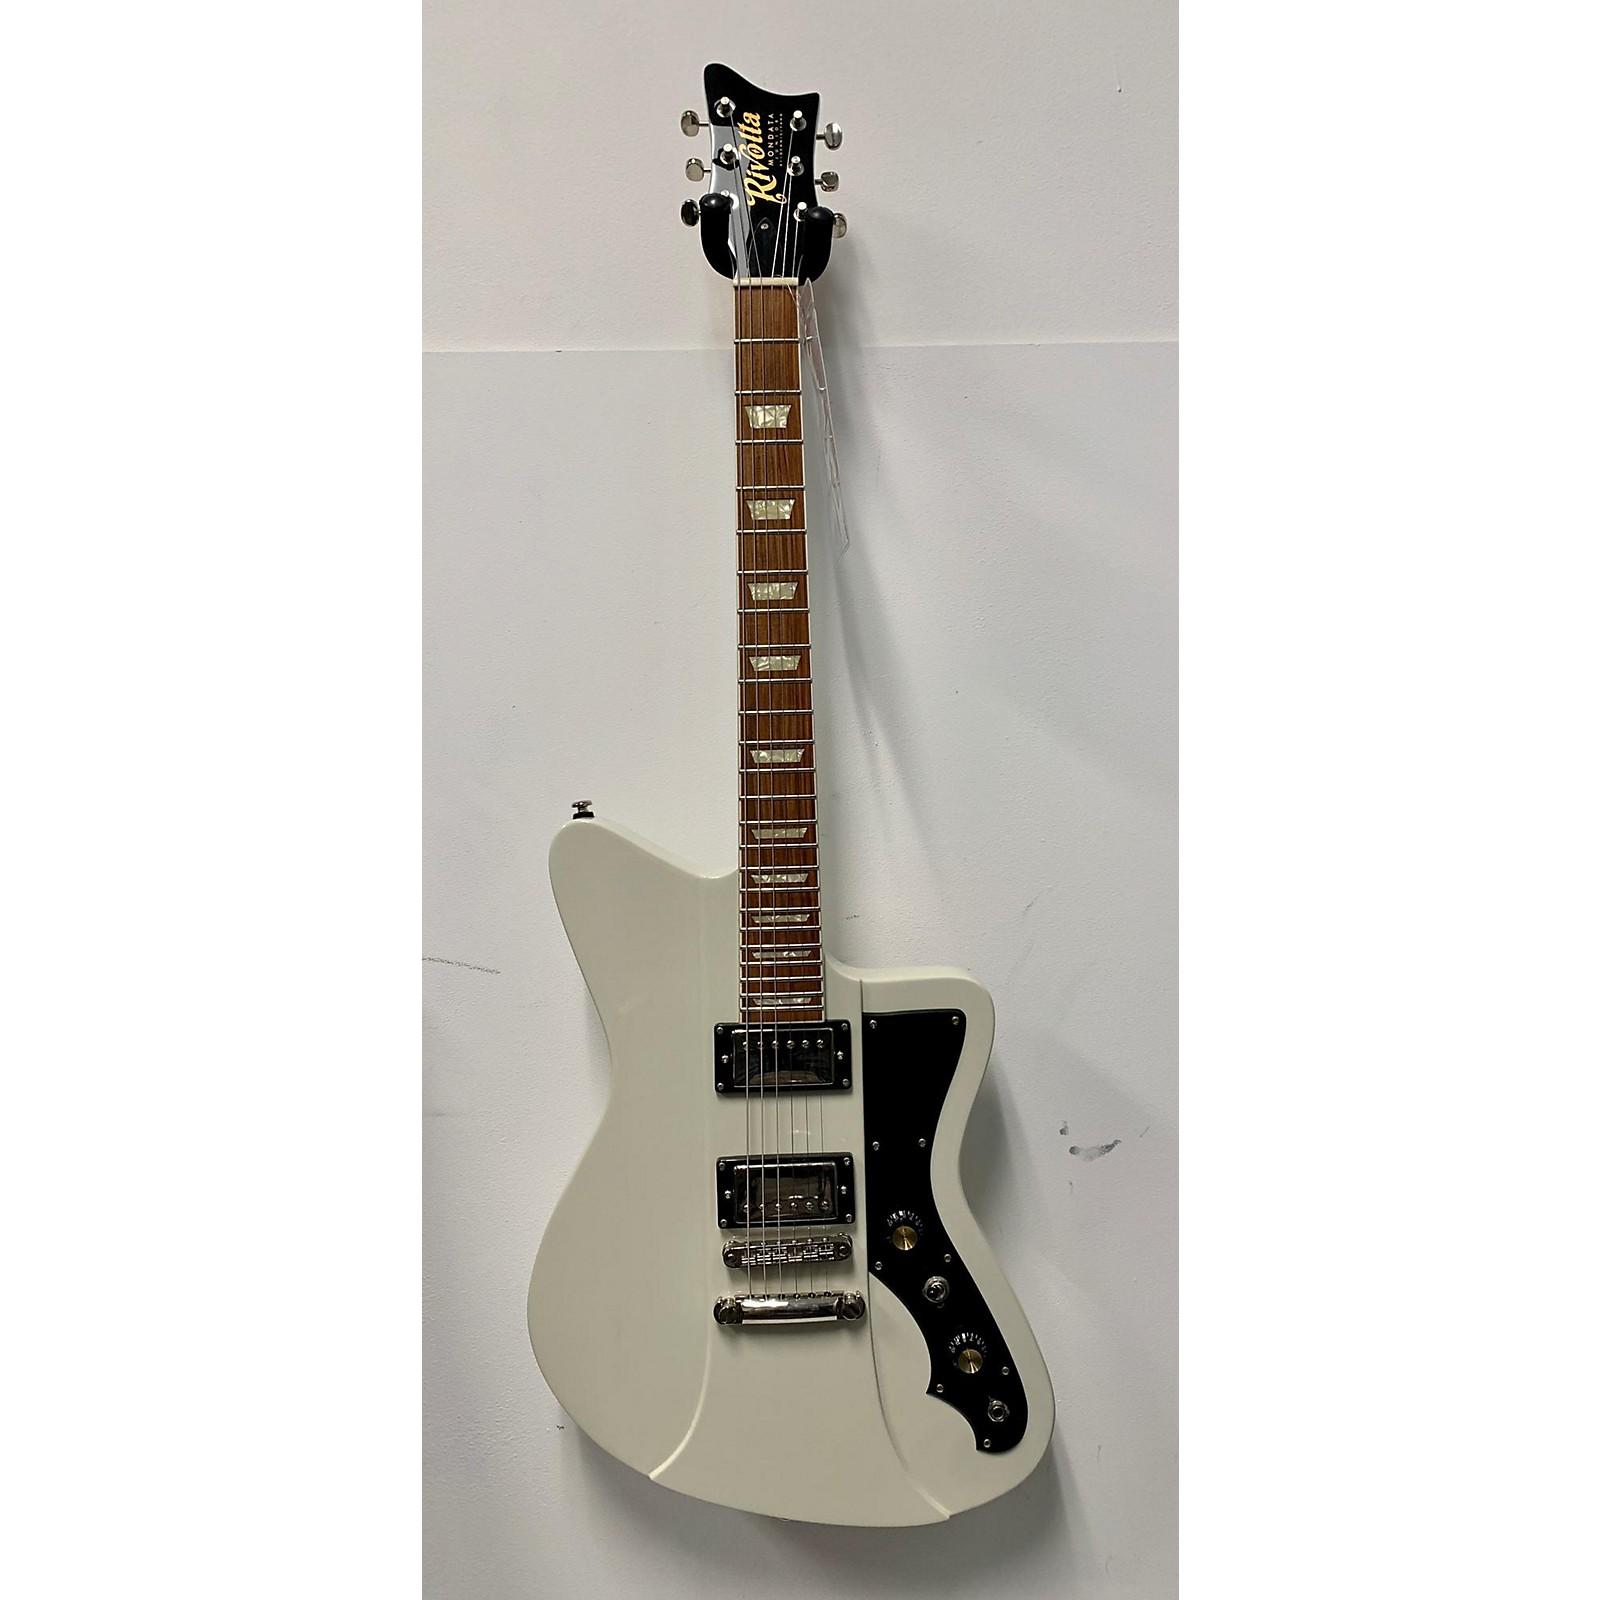 In Store Used Used RIVOLTA MONDATA JUNIOR Alpine White Solid Body Electric Guitar